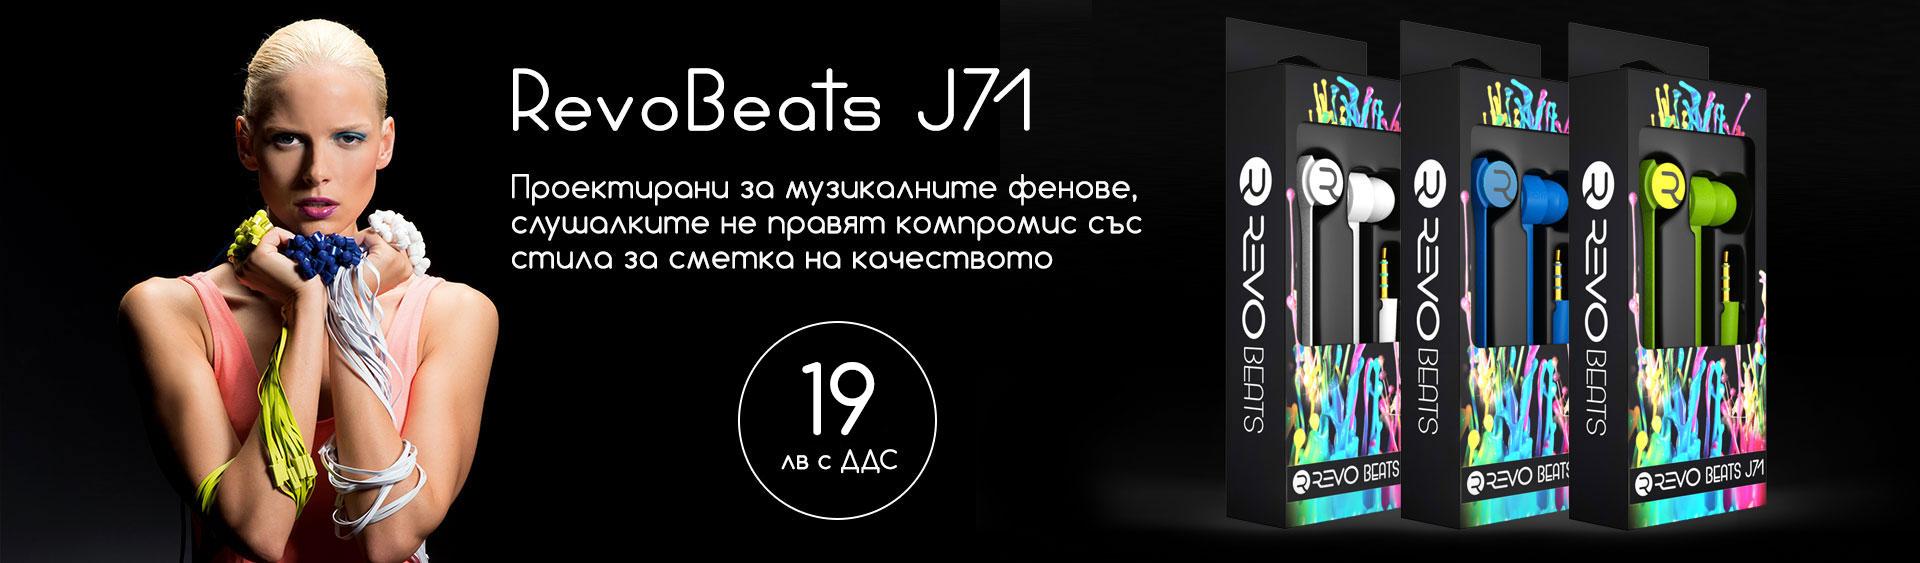 Слушалки RevoBeats J71